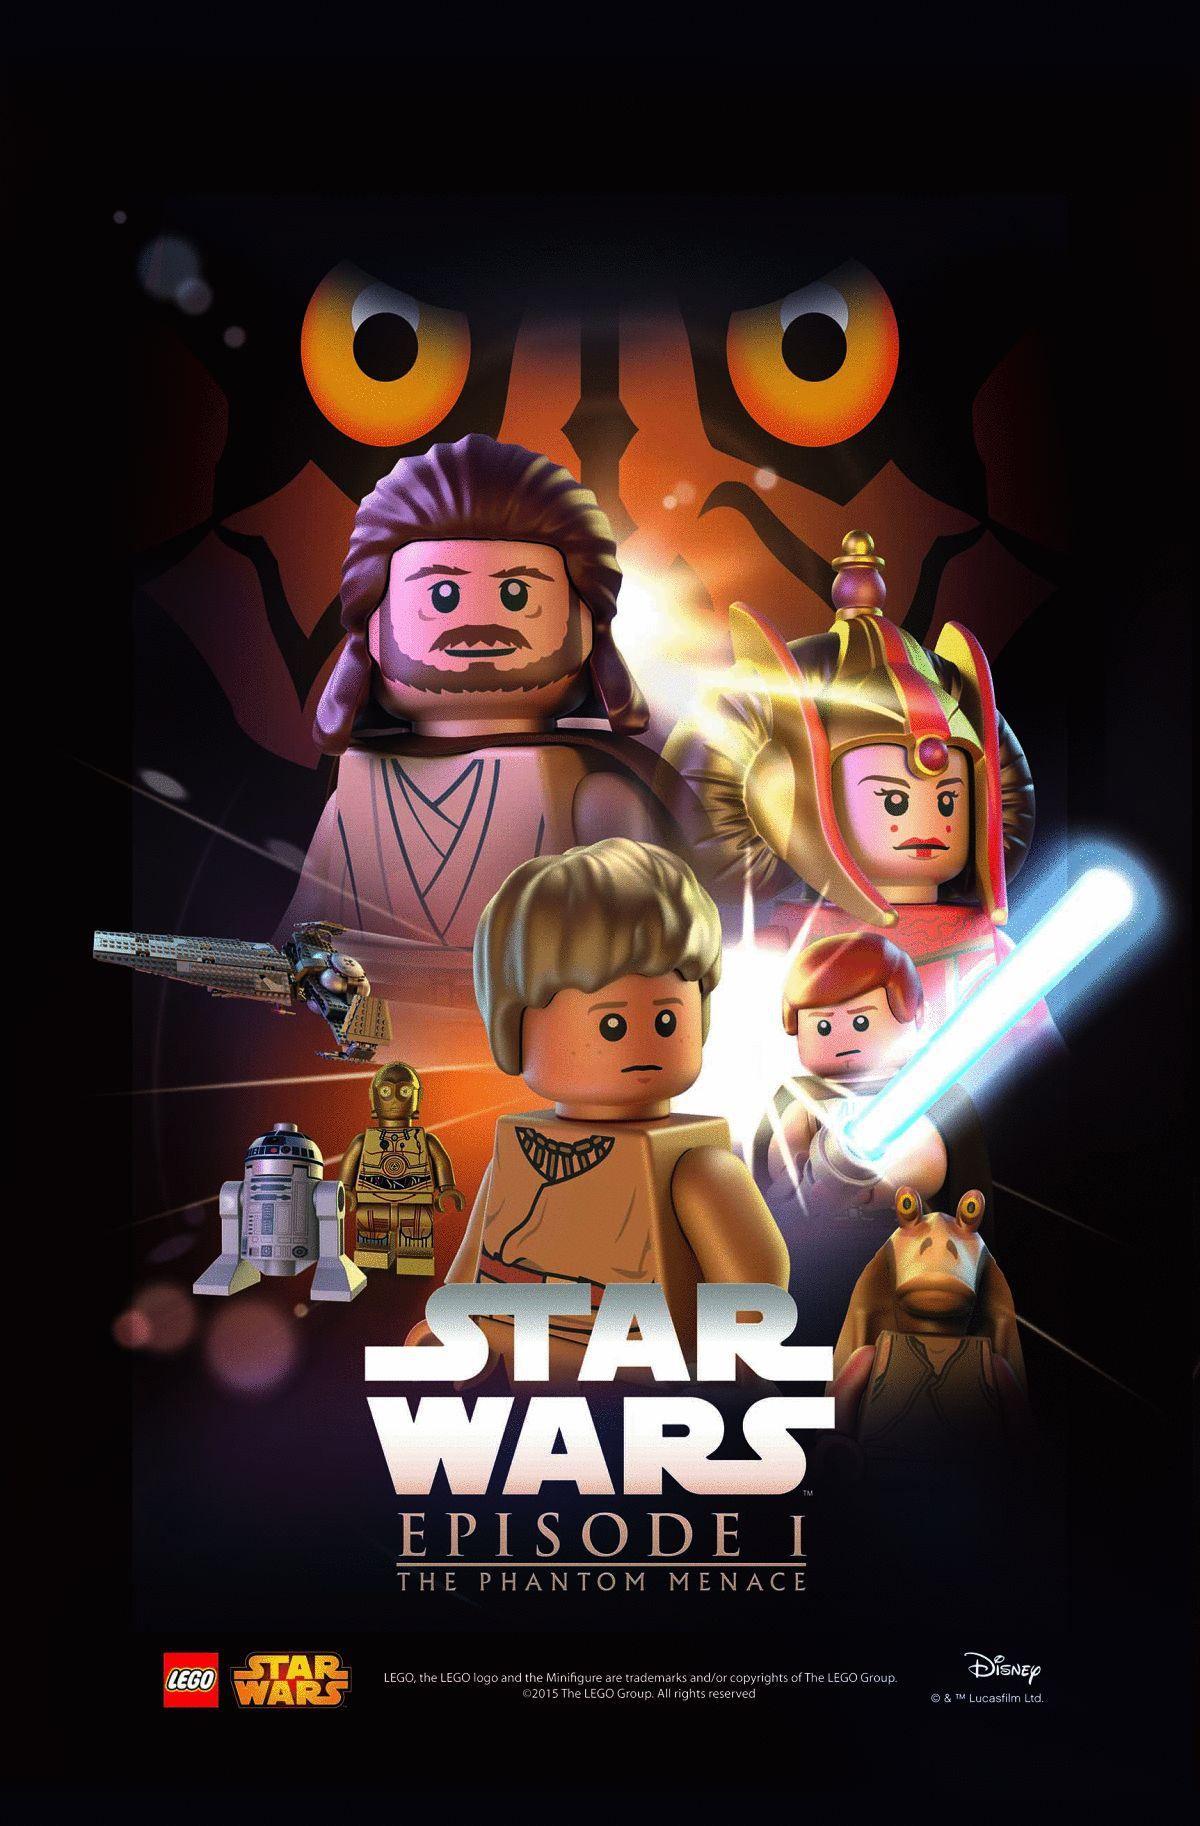 star wars hd printable poster wallpaper episode 1 the phantom menace lego poster